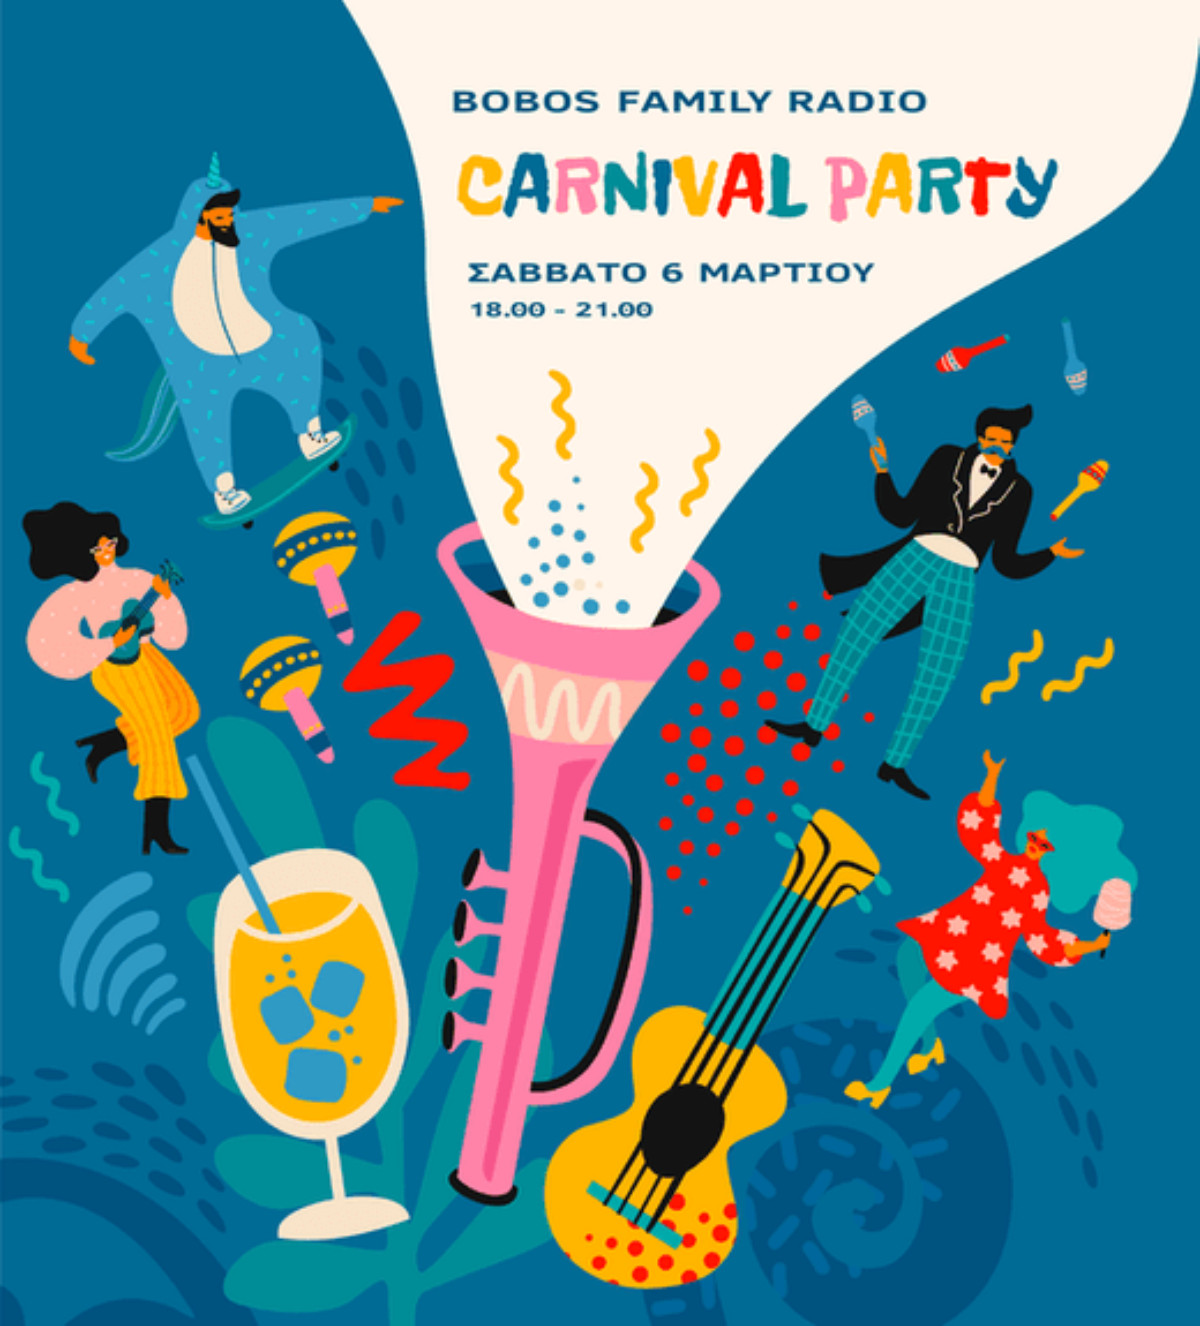 Bobos Family Radio | Carnival Party 6.3.21